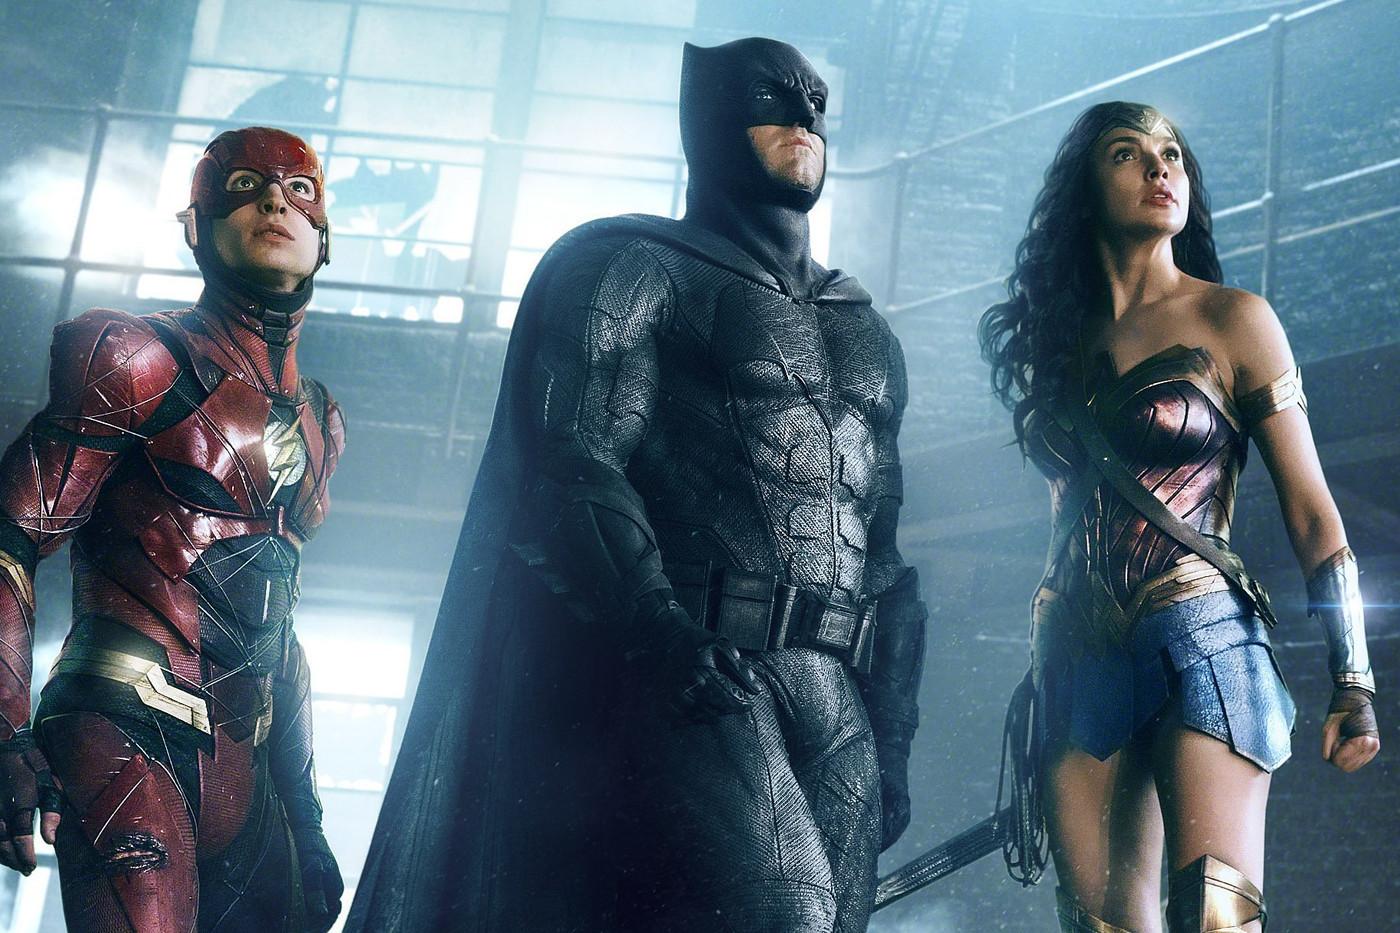 Justice League'in orjinal versiyonu için tarih belli oldu